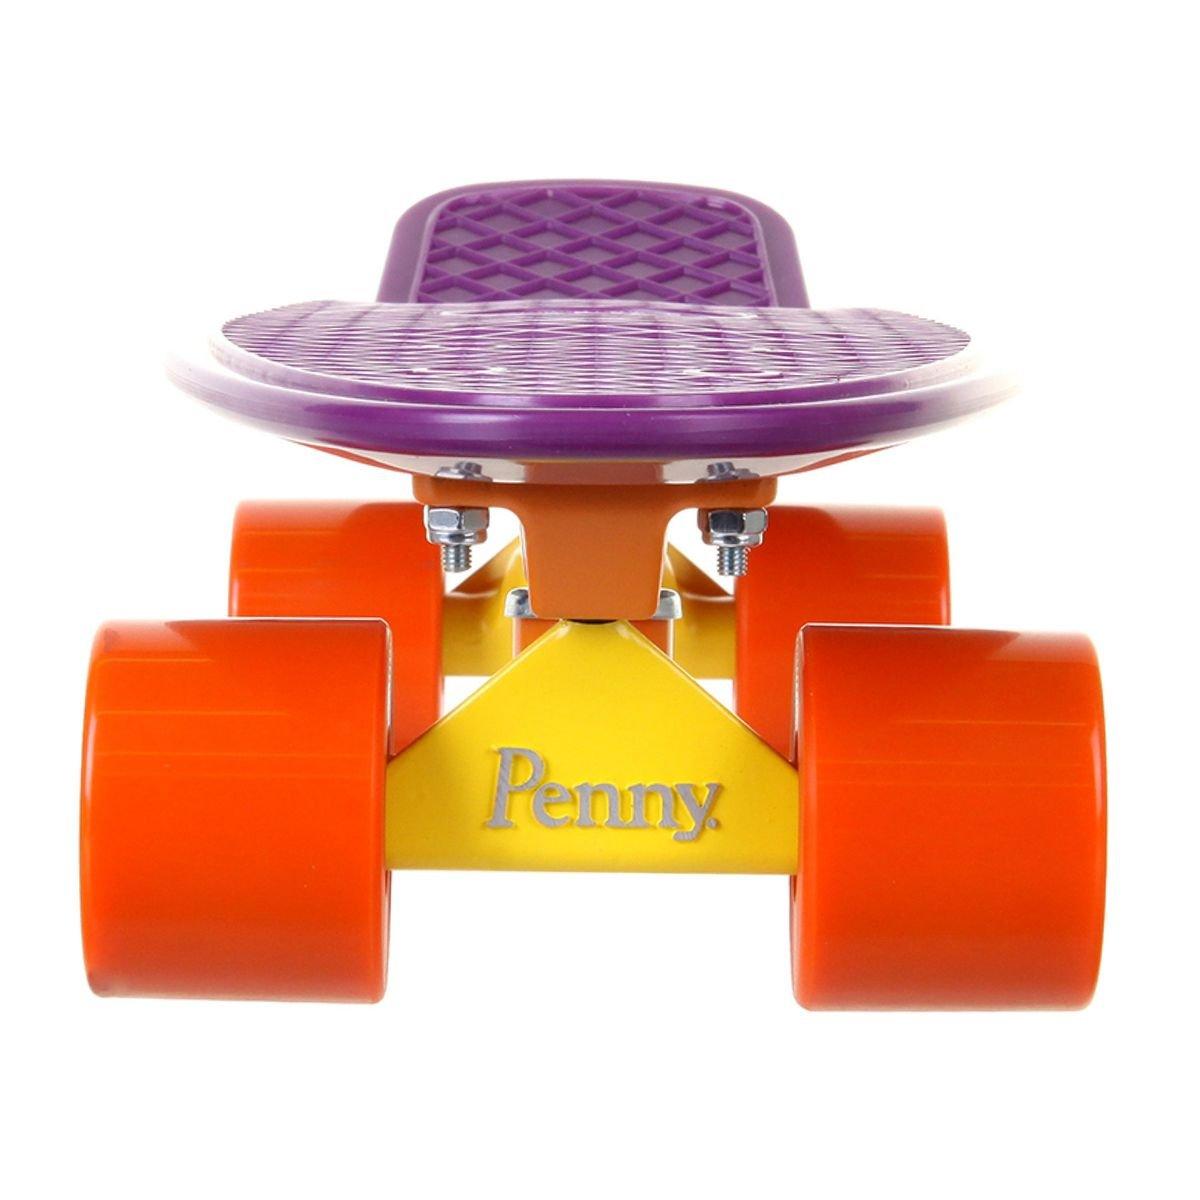 Penny Kinder Lagoon Skateboard B01E5T5LQ4 Decks Gute Gute Gute Qualität 250cbc